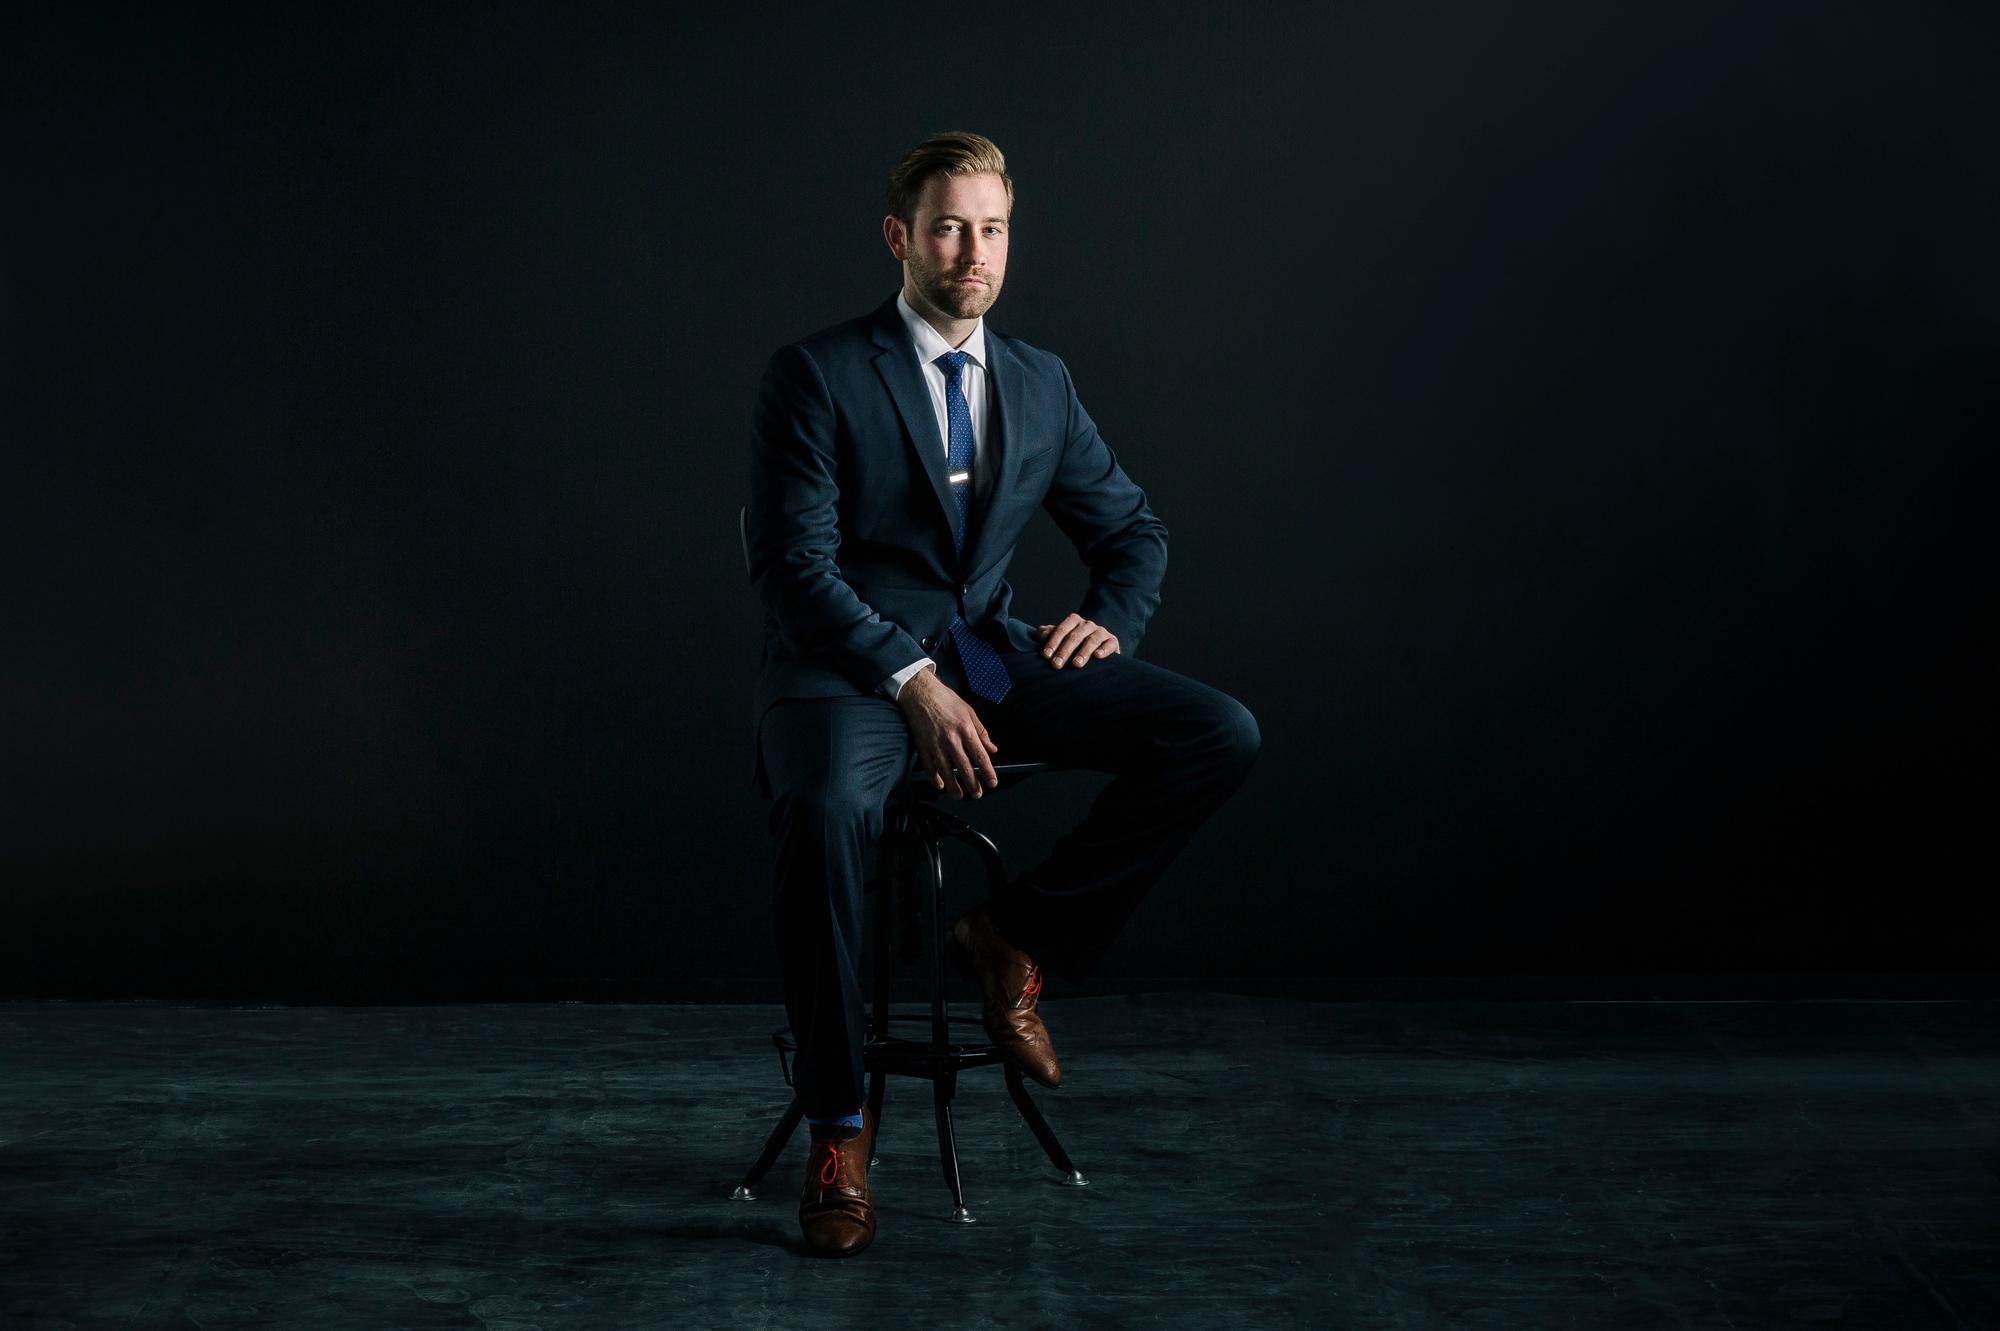 Professional, Portfolio & Business Head Shots in Halifax